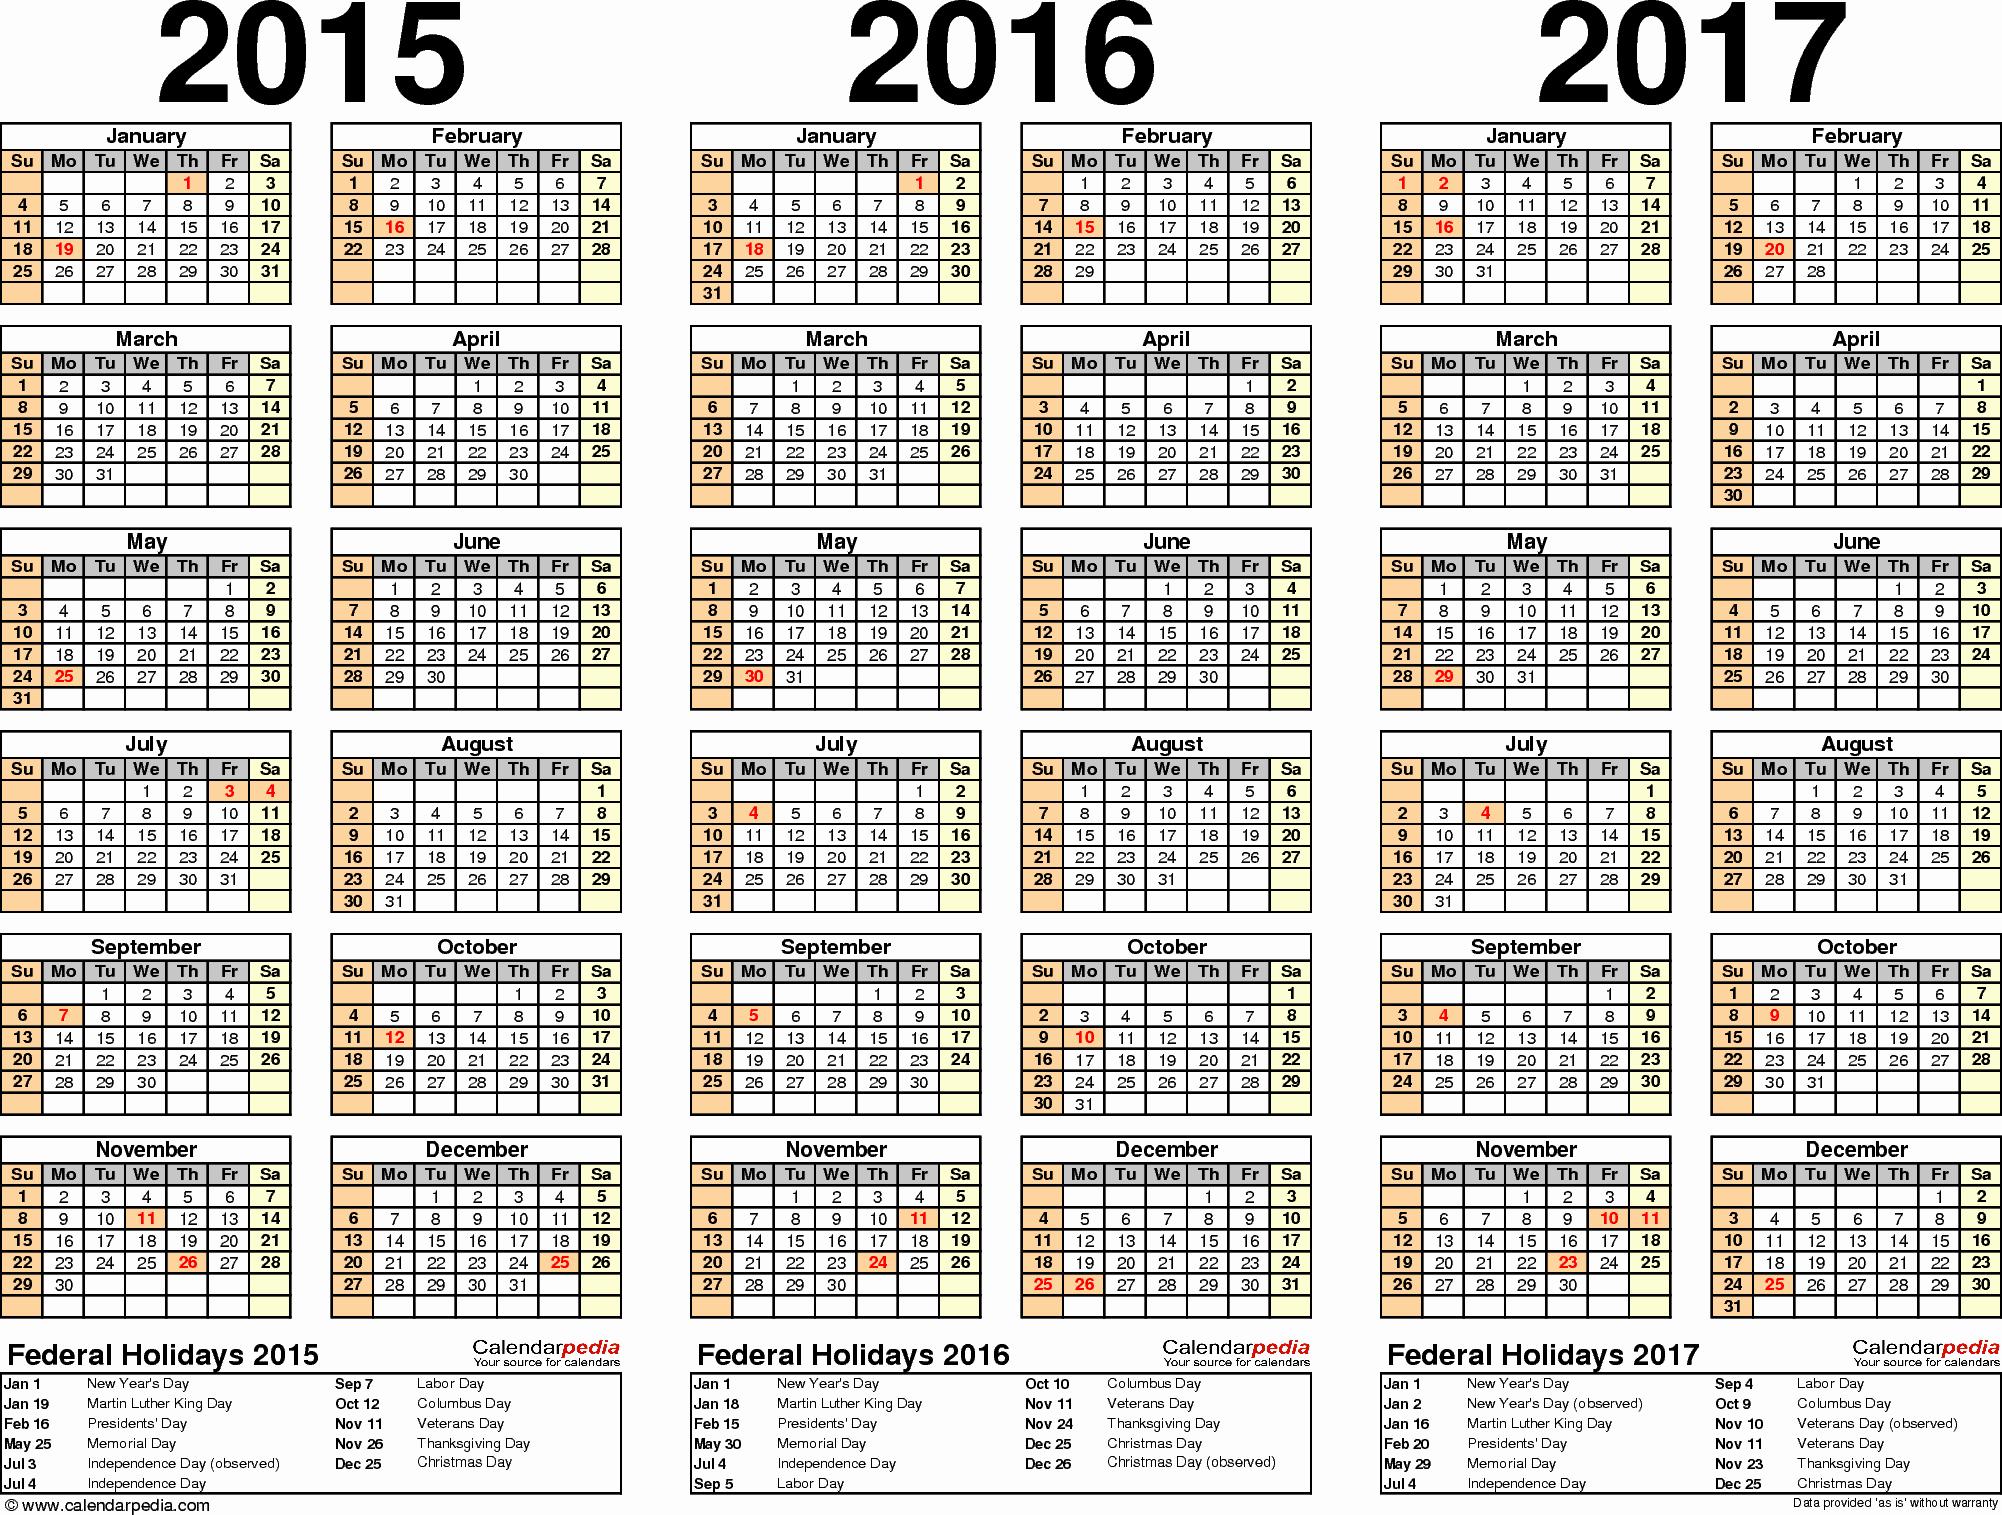 Free Employee attendance Calendar 2016 New Free Printable Employee attendance Calendar Template 2016